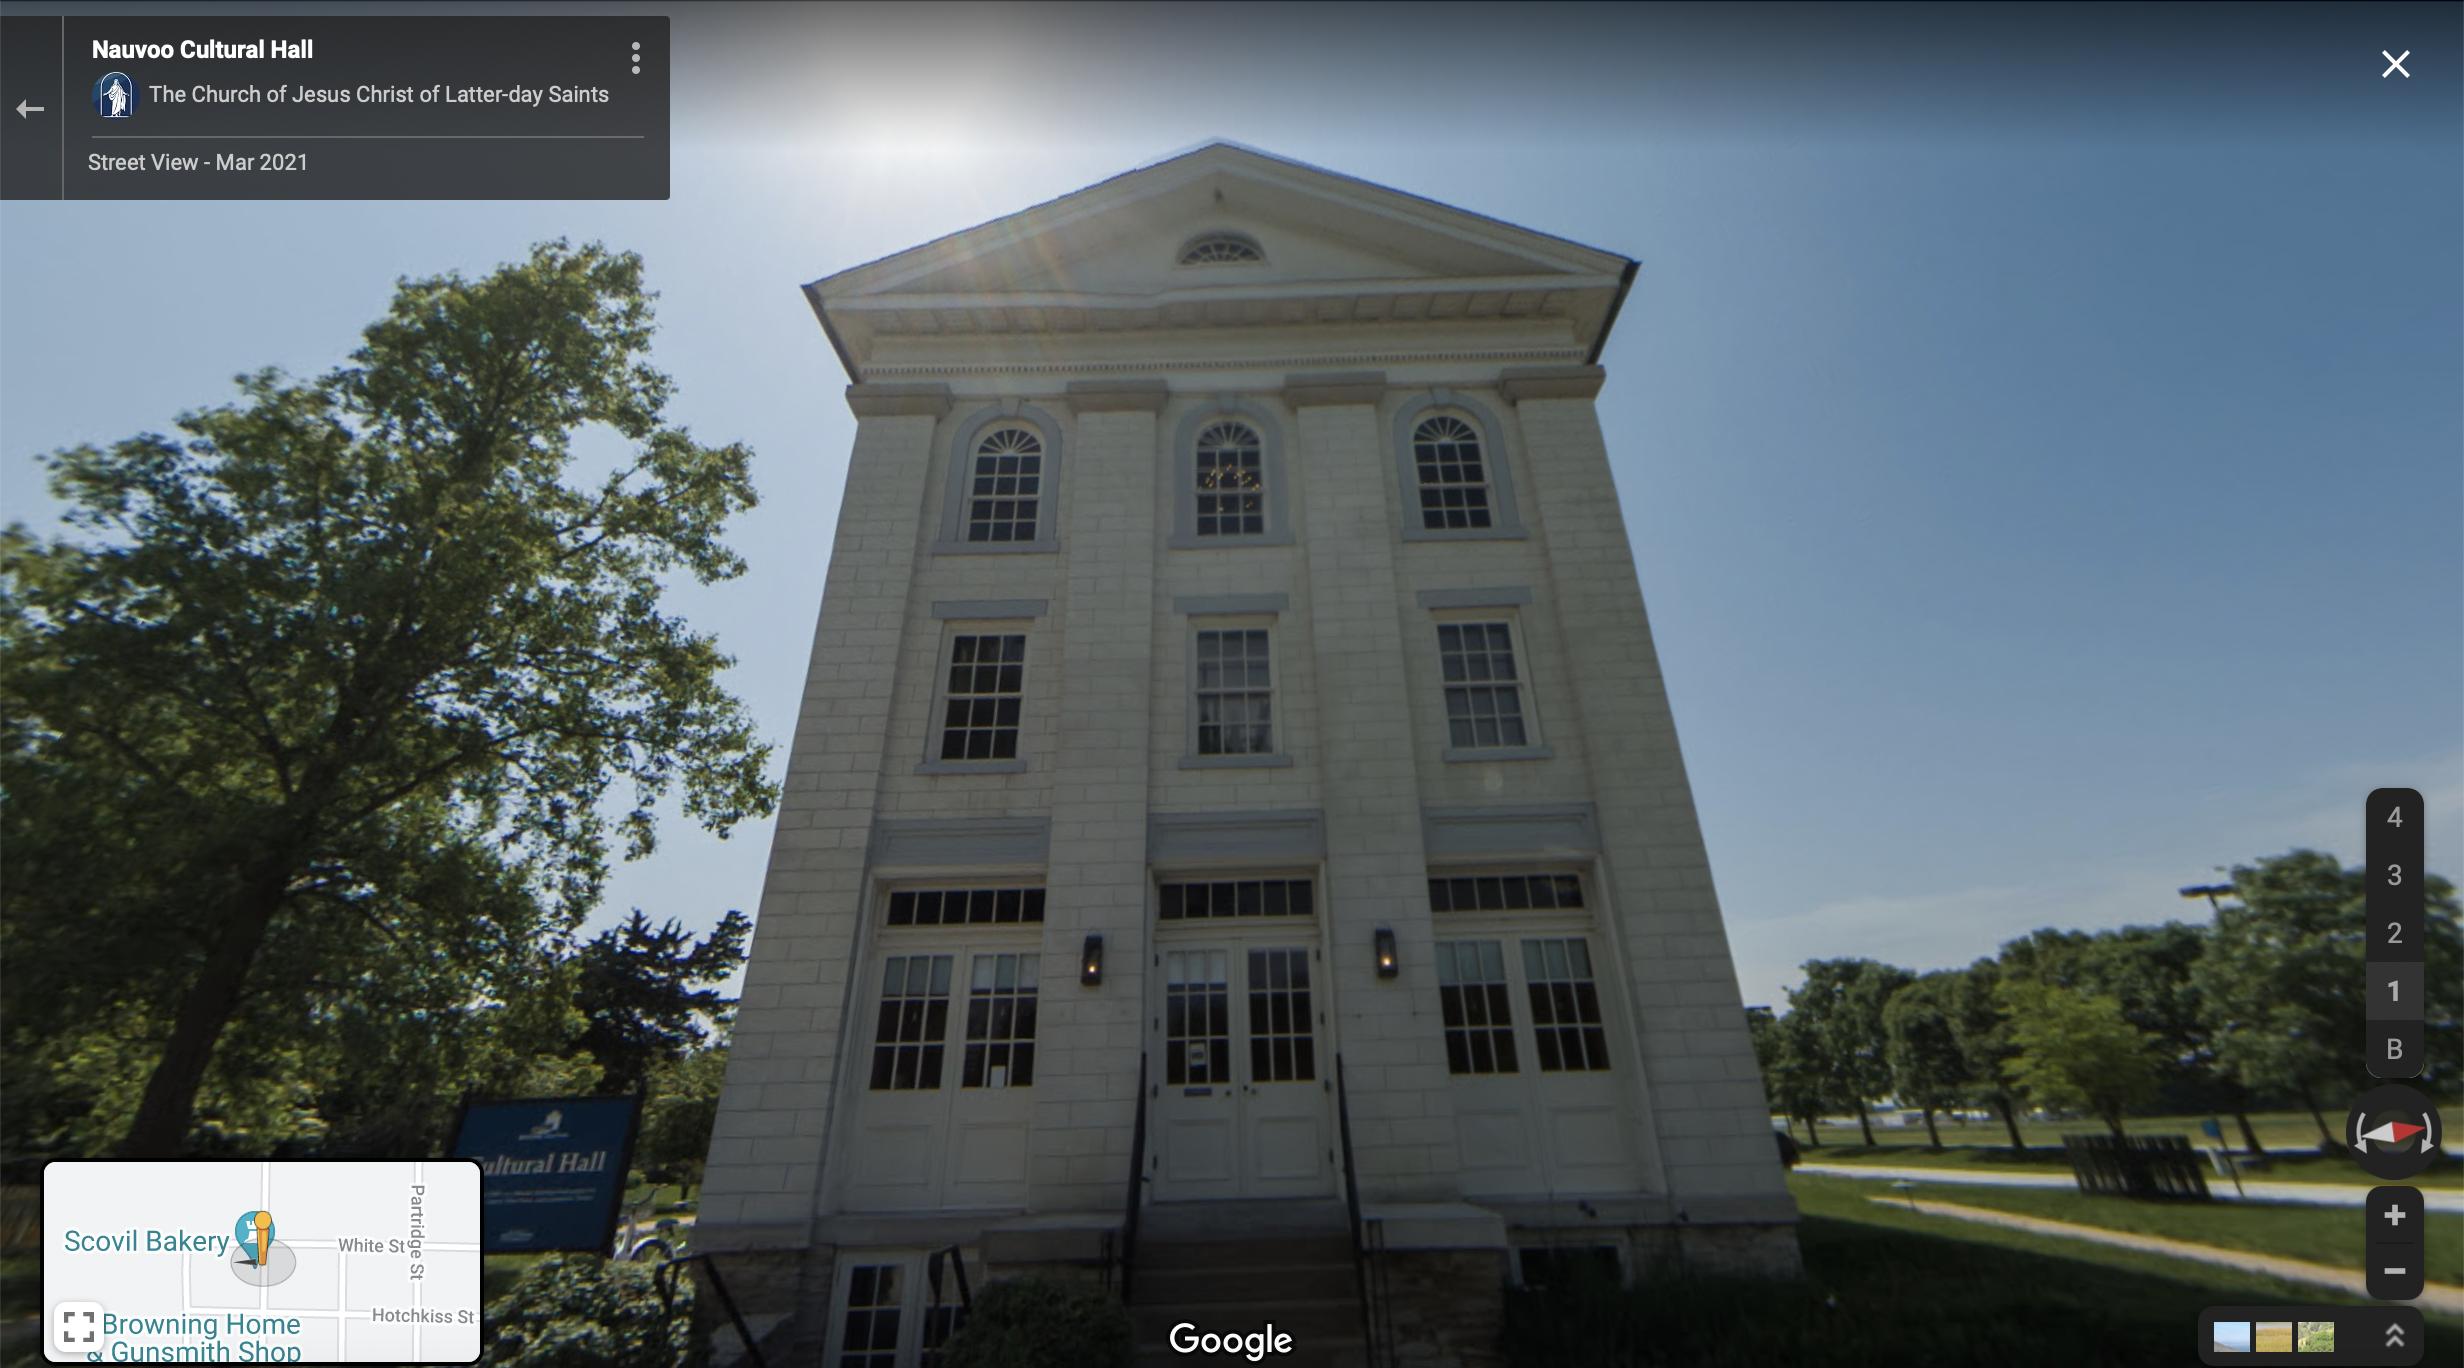 Screenshot of the Google Maps 360 view of the Nauvoo Seventies Hall